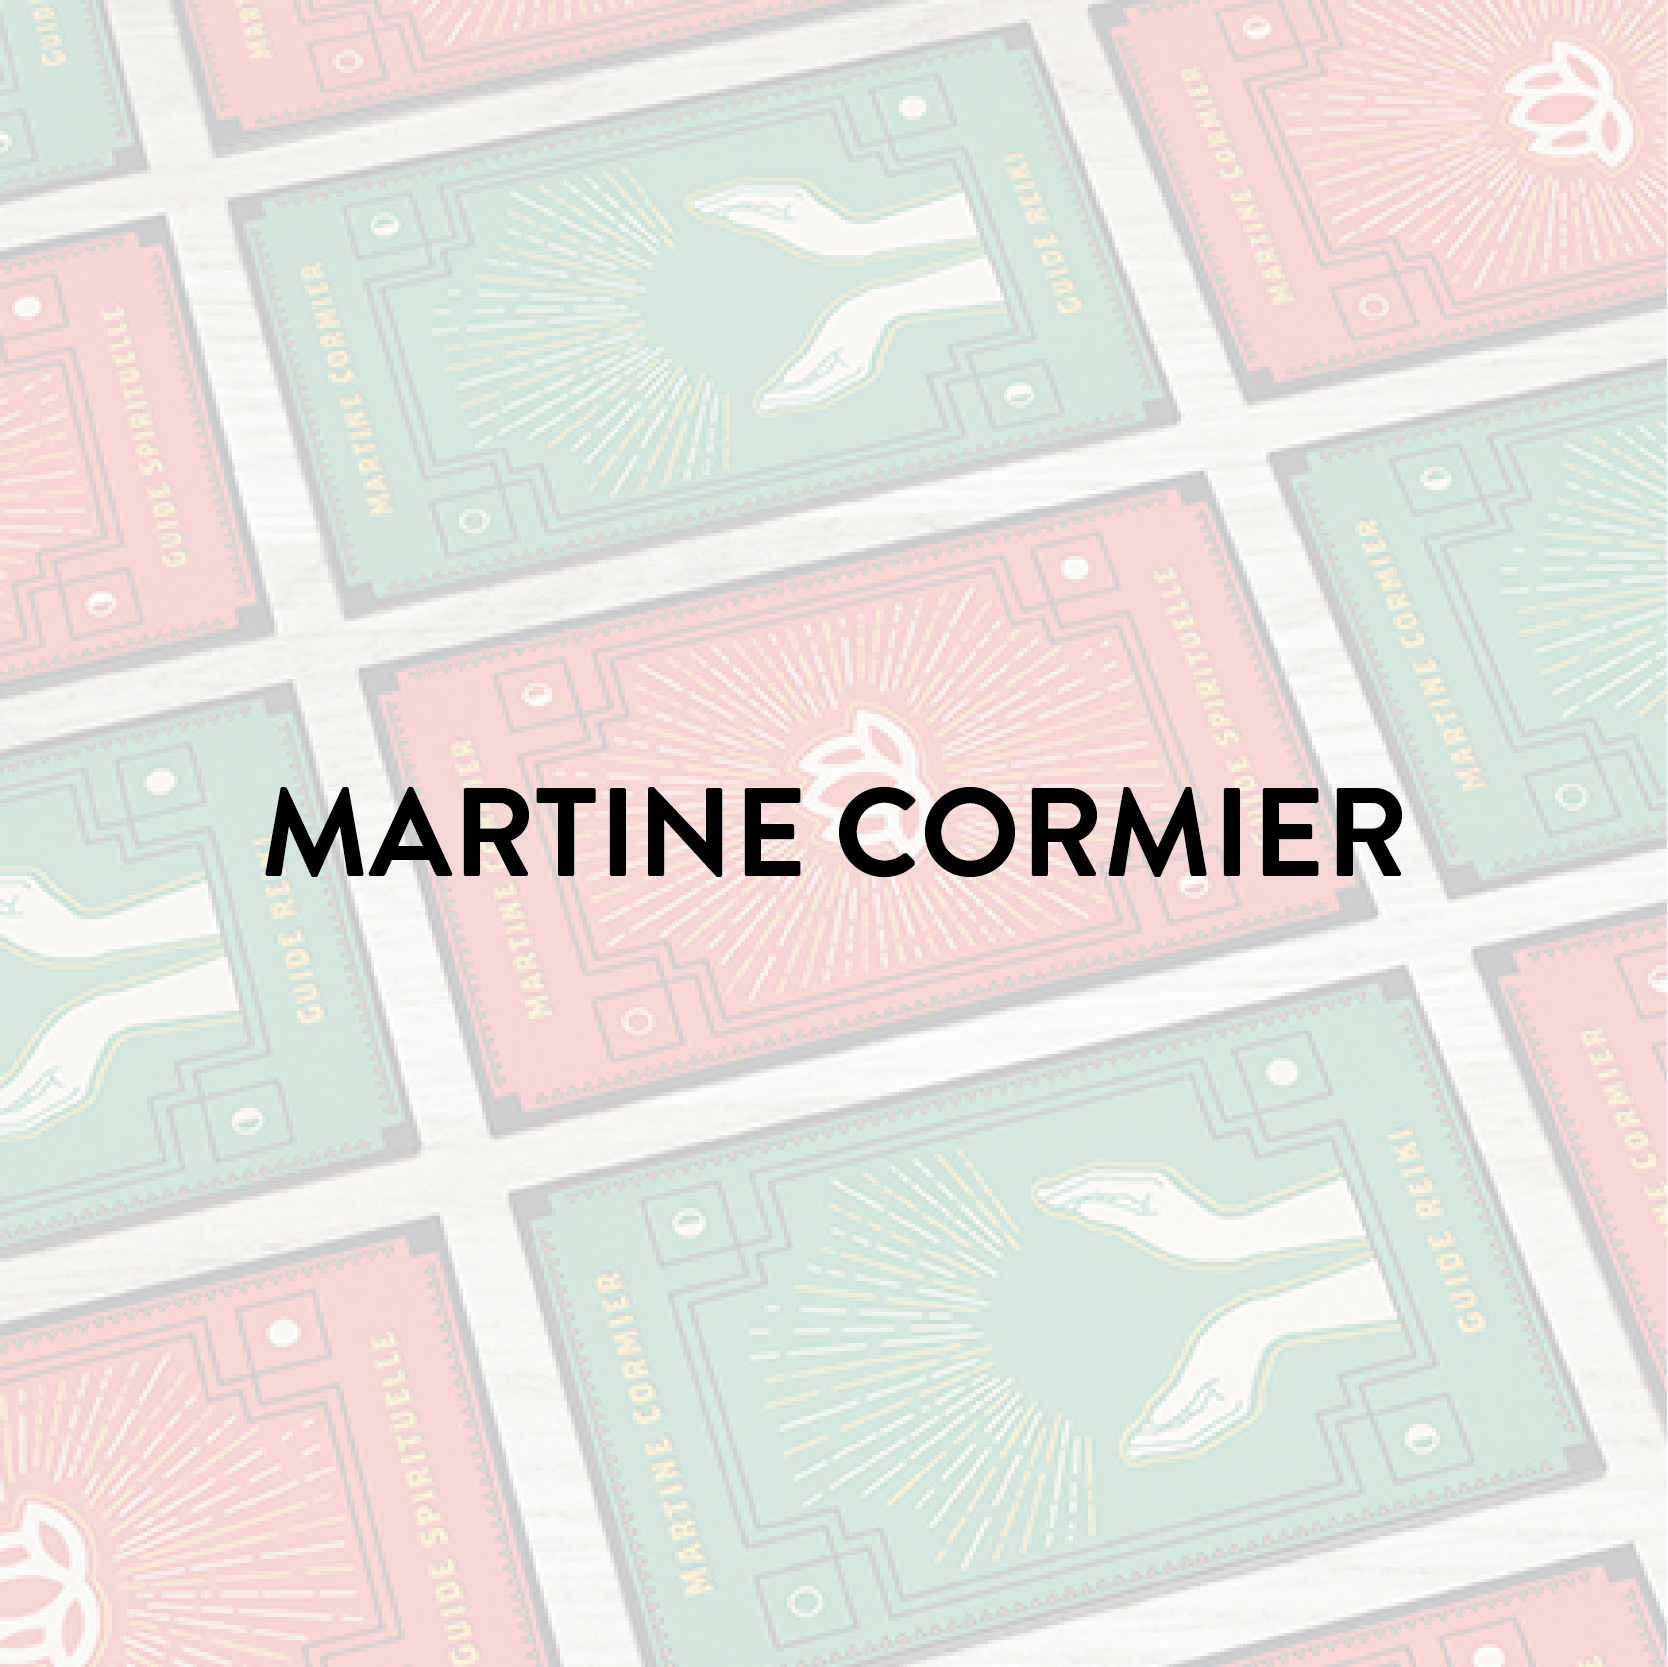 Martine Cormier